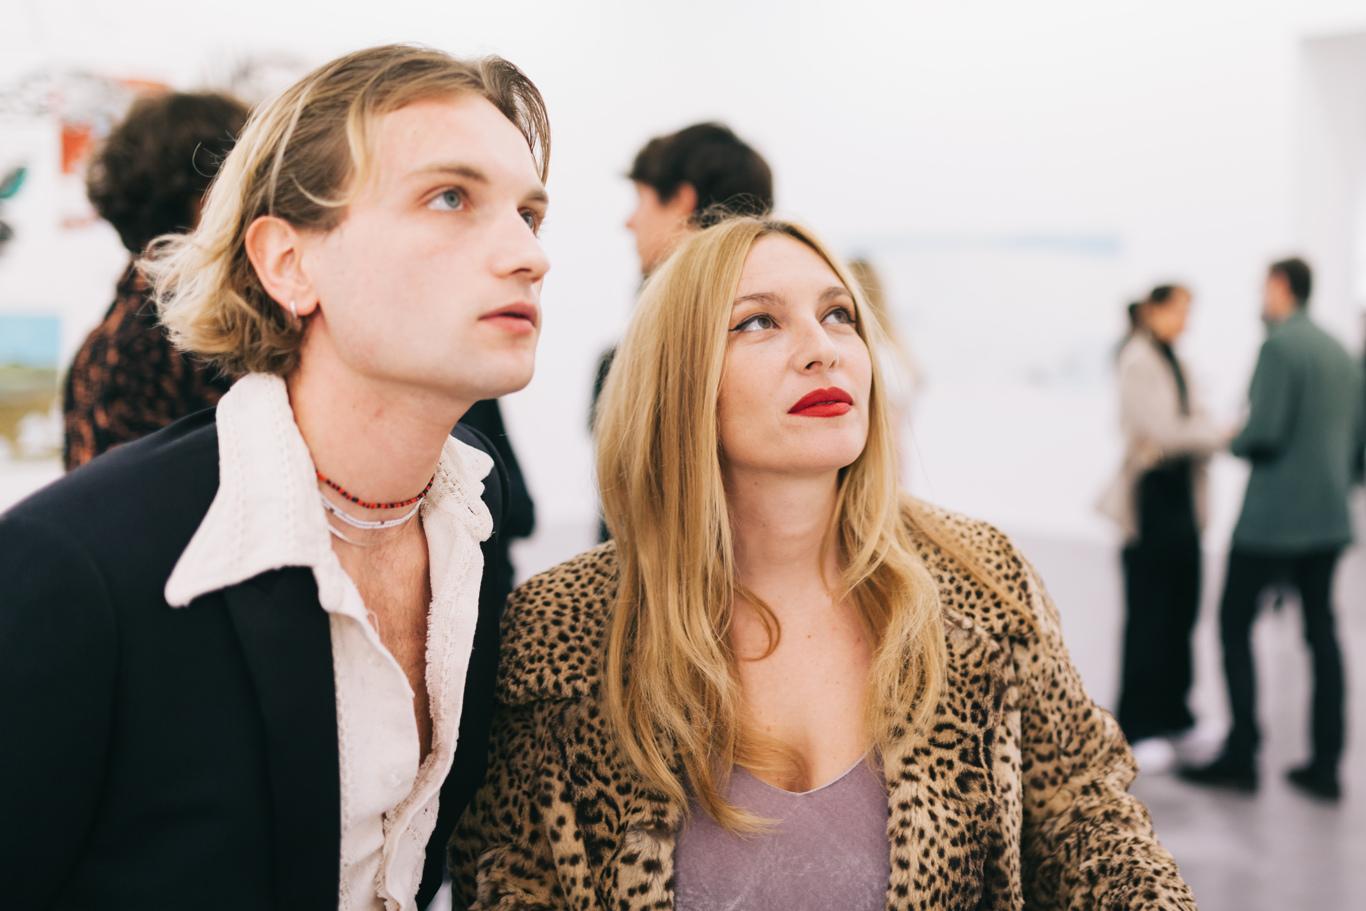 Lukas Ionesco and JosŽphine de La Baume